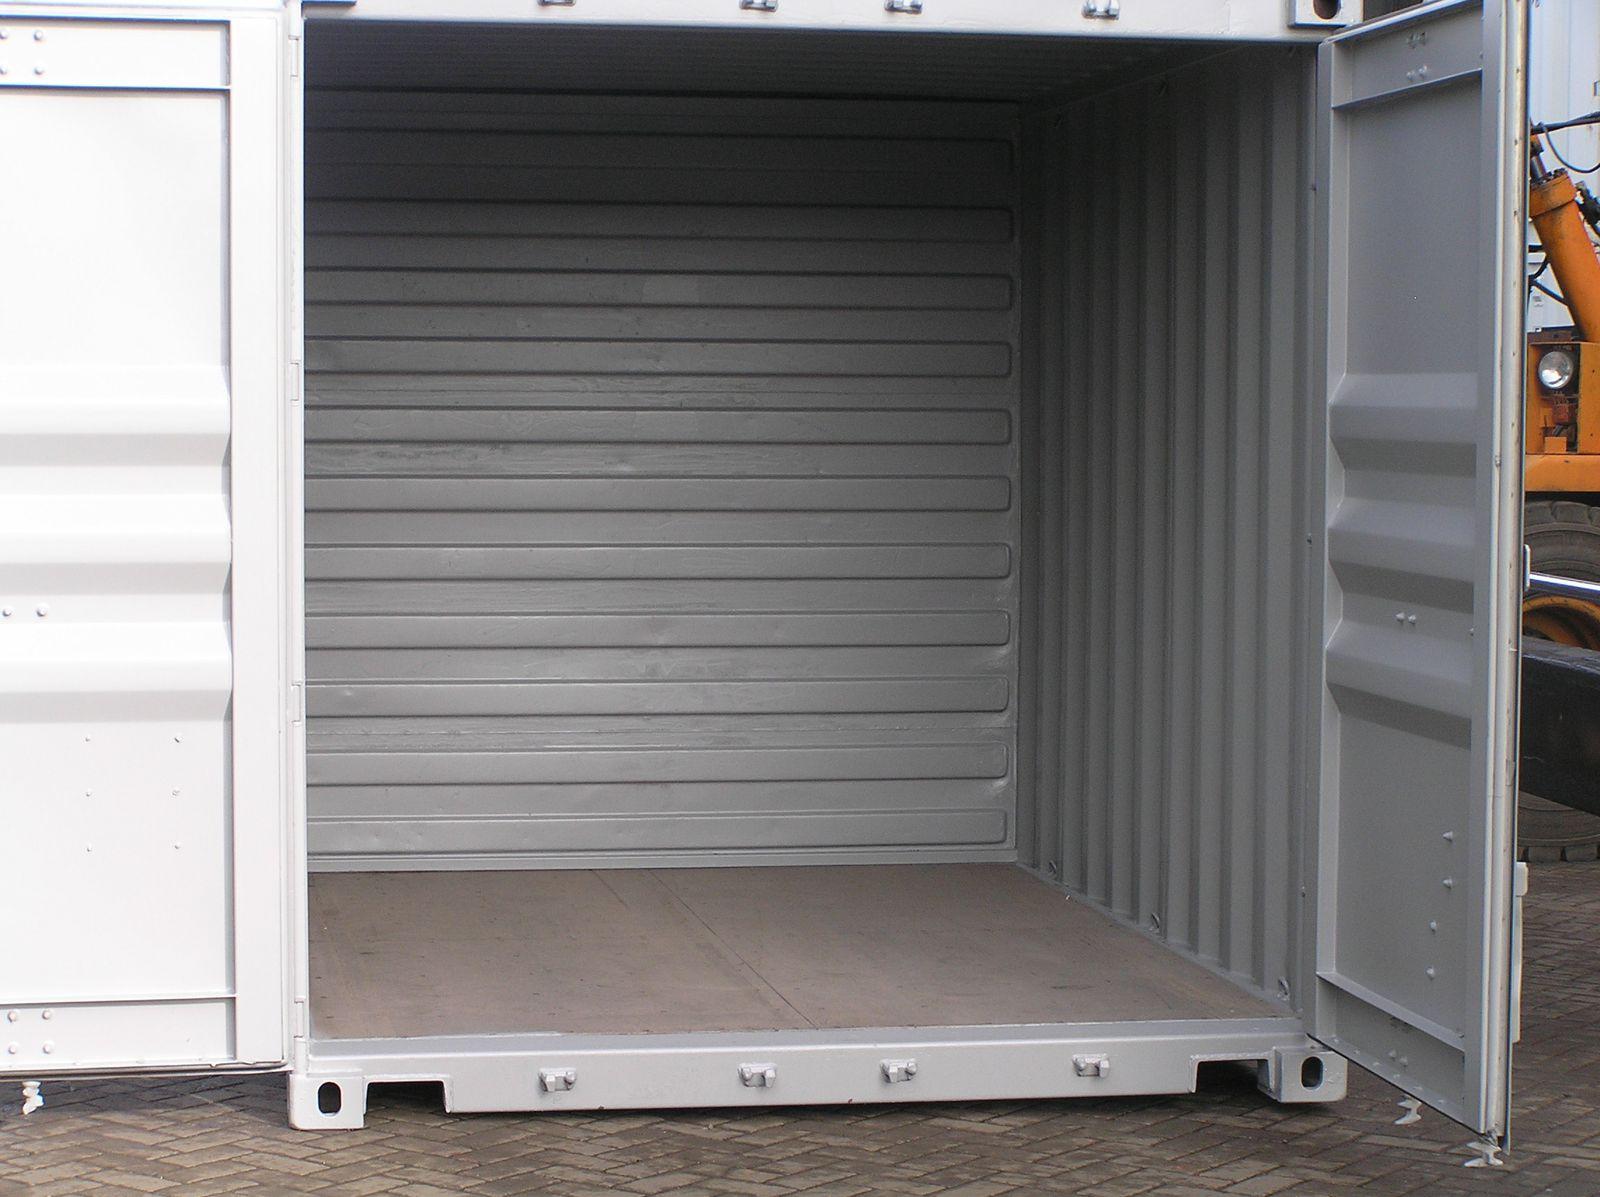 amnagement de container good emplacement modules de stockage container de stockage conteneur. Black Bedroom Furniture Sets. Home Design Ideas